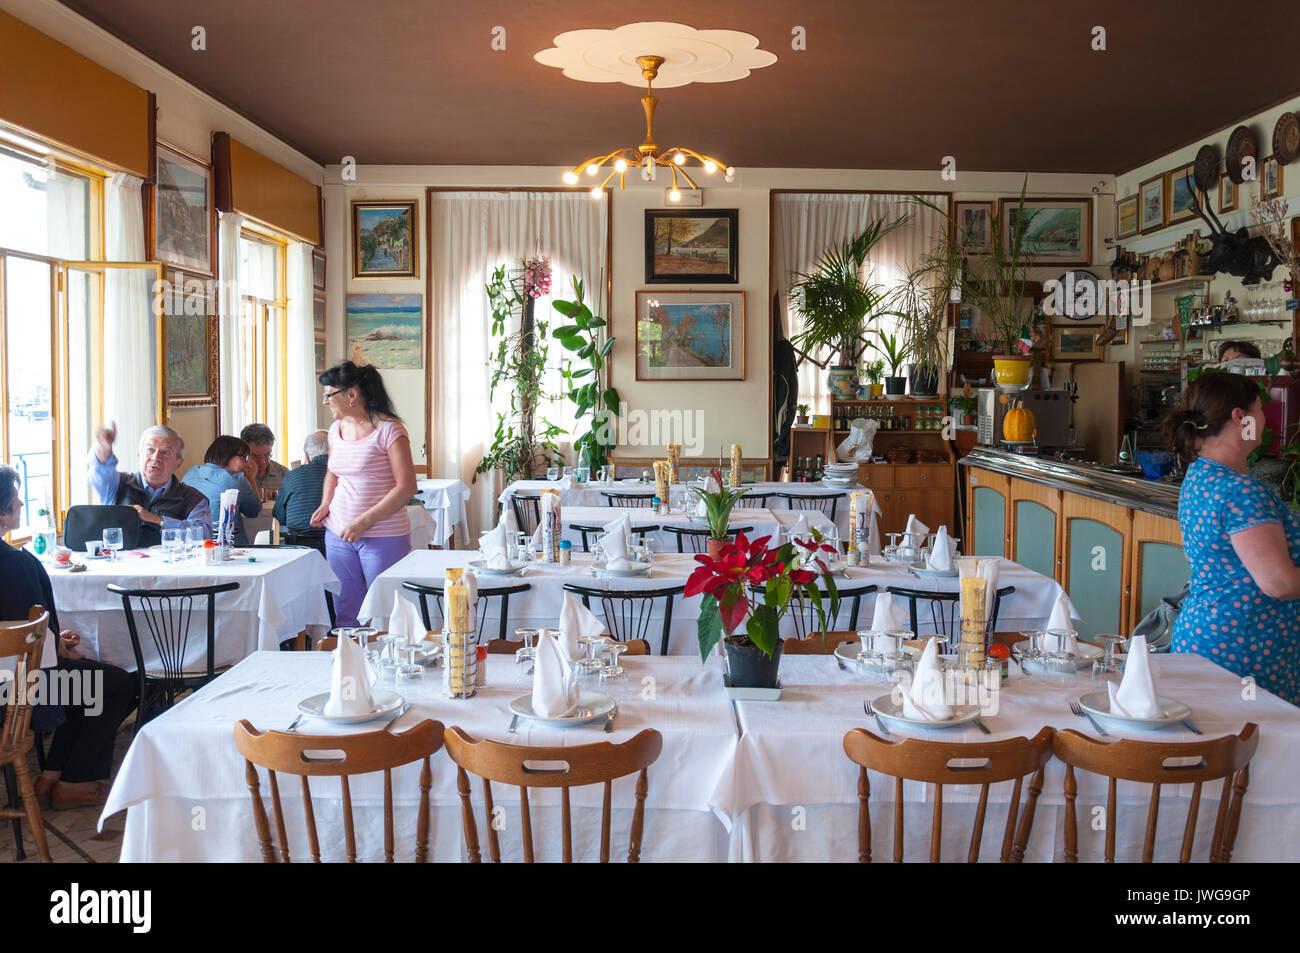 Restorante Milano at Peschiera Maraglio Monte Isola, Lake Iseo, Italy - Stock Image